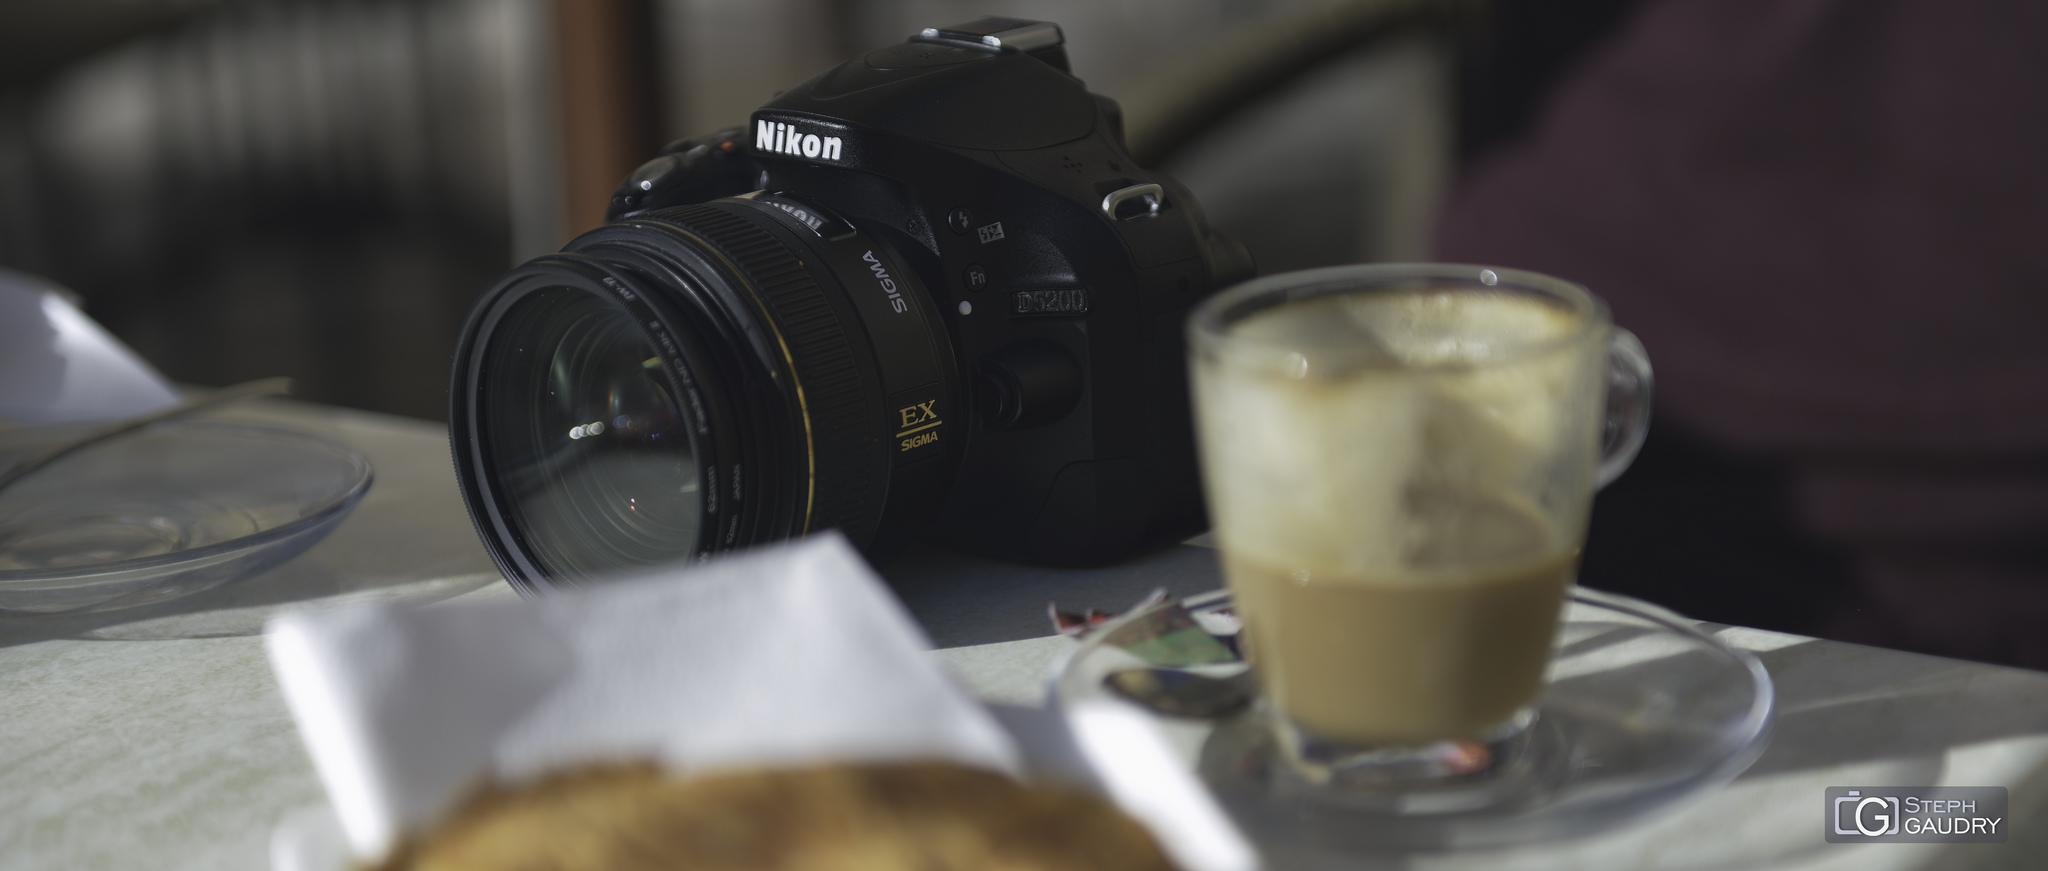 Nikon D5200 - Sigma 30mm f1,4 EX DC HSM [Click to start slideshow]